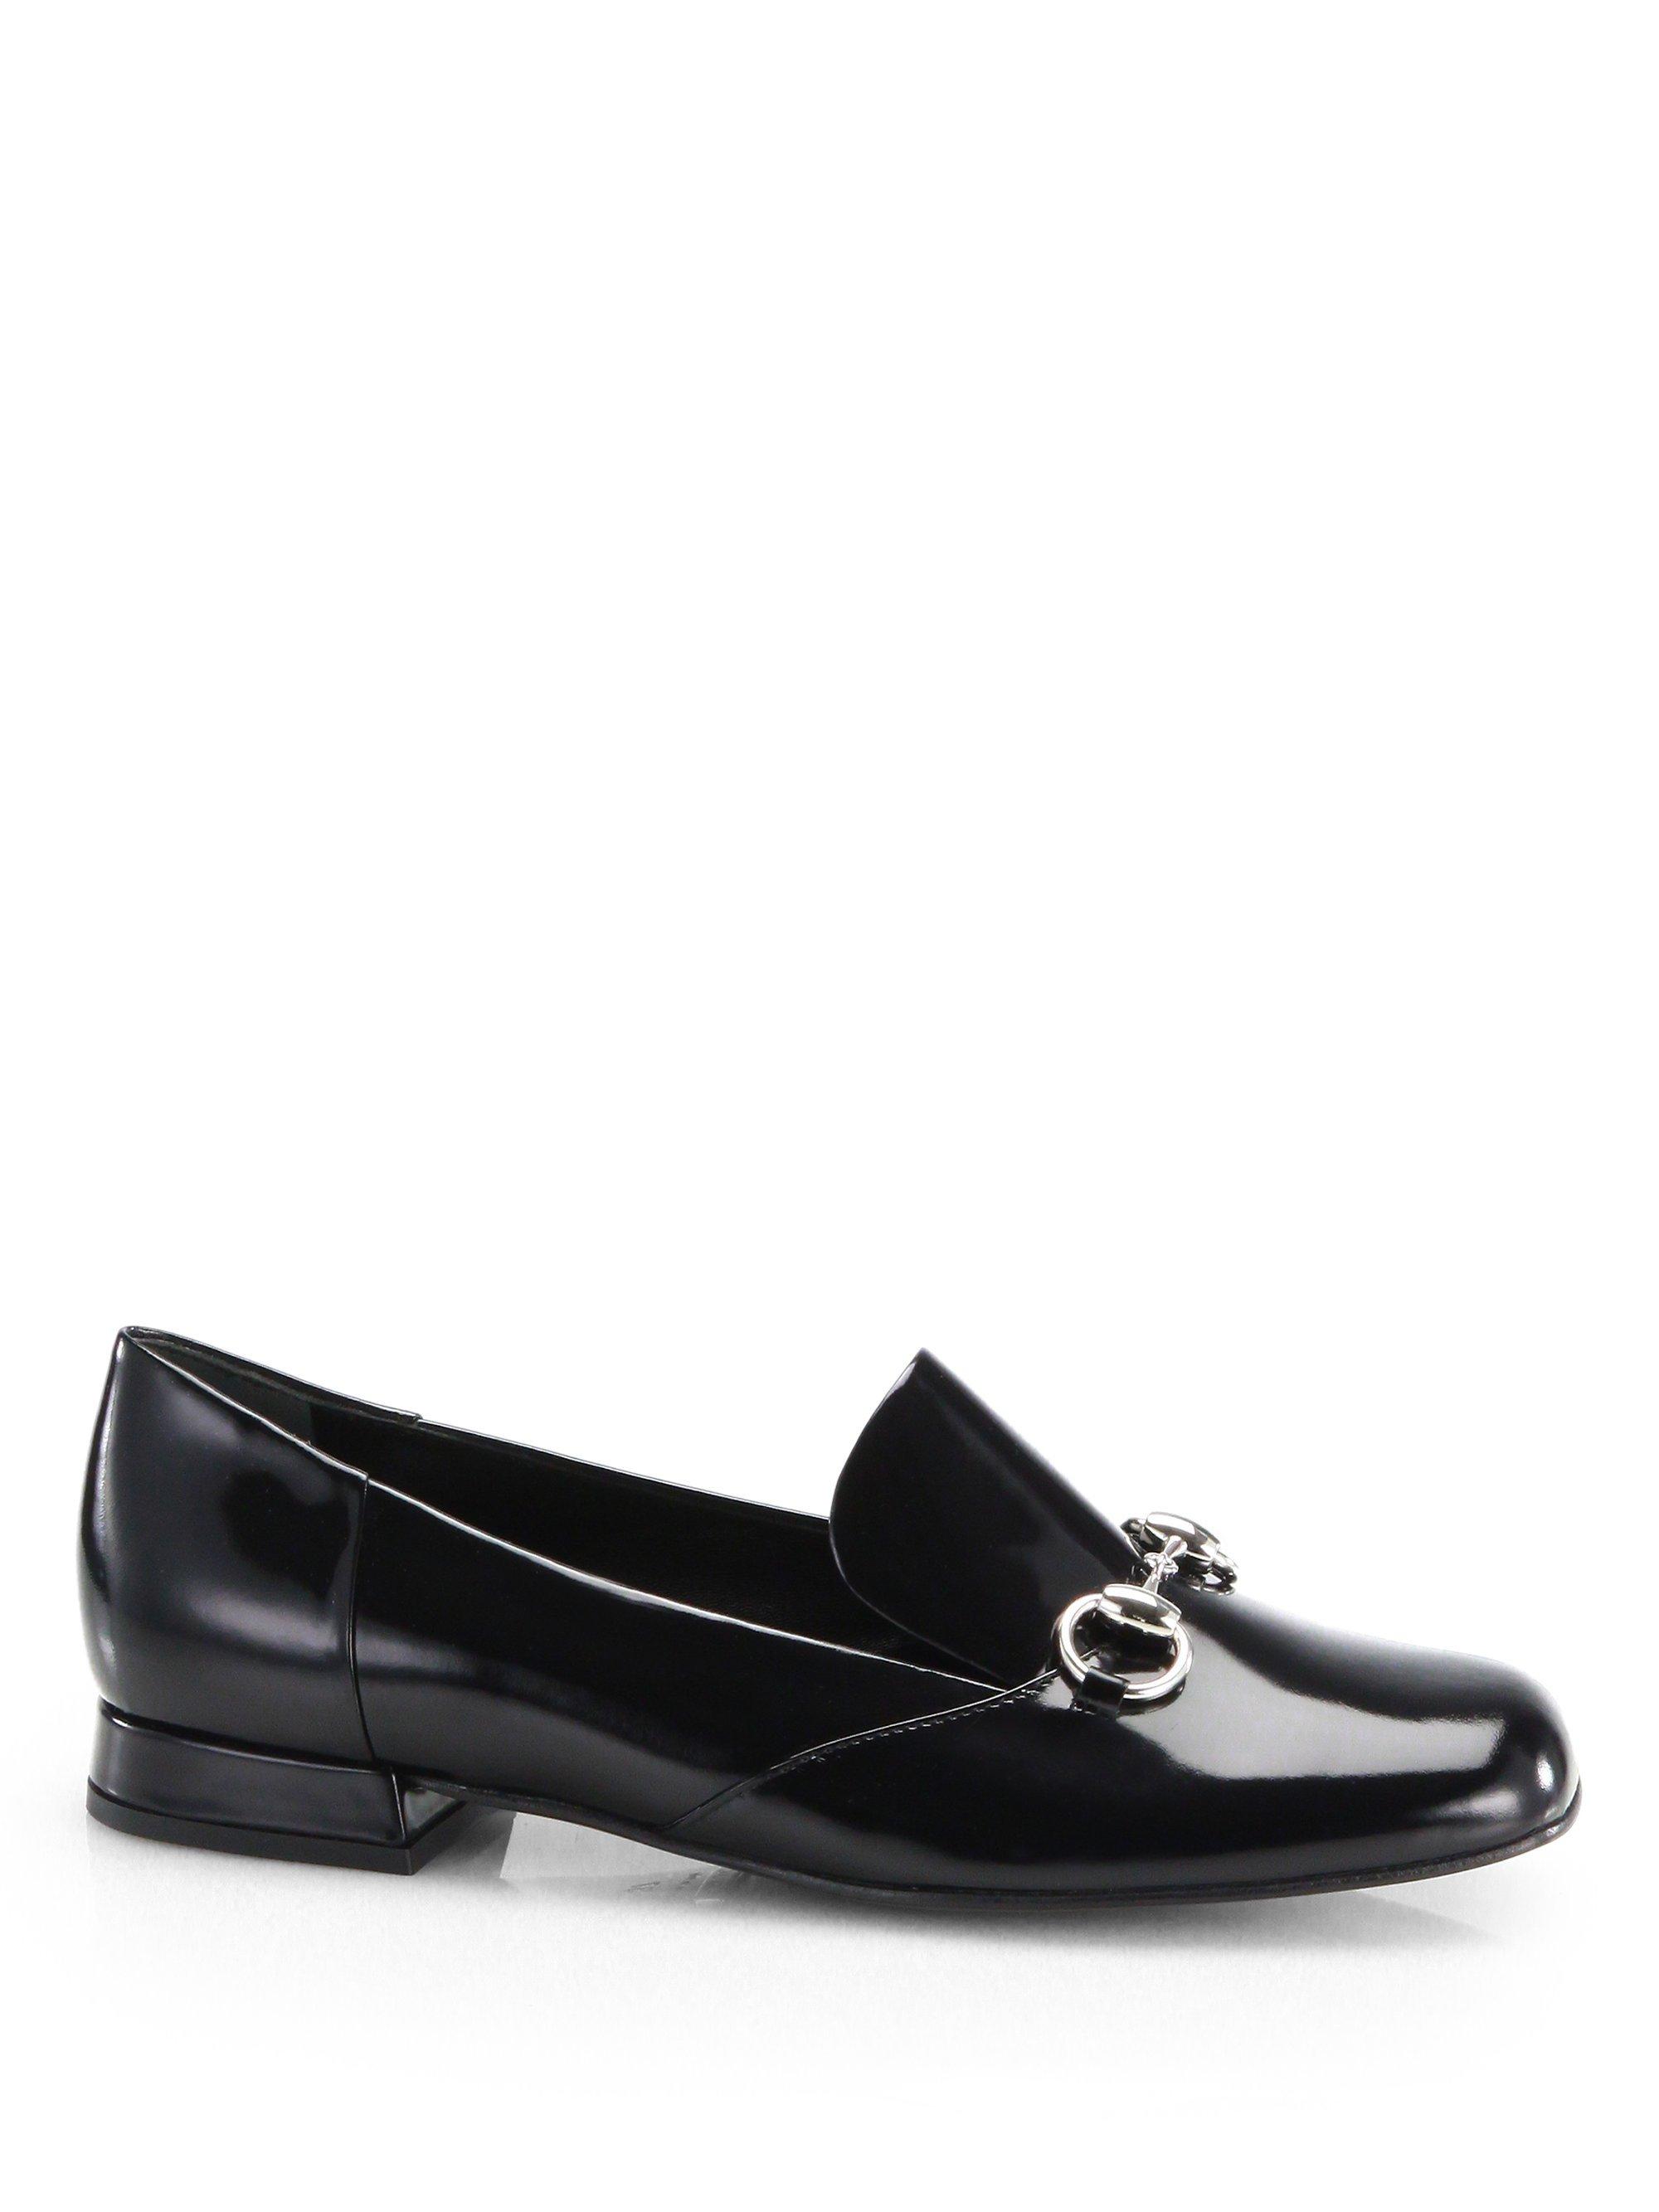 179f81db5cc Gucci Horsebit Loafers Black